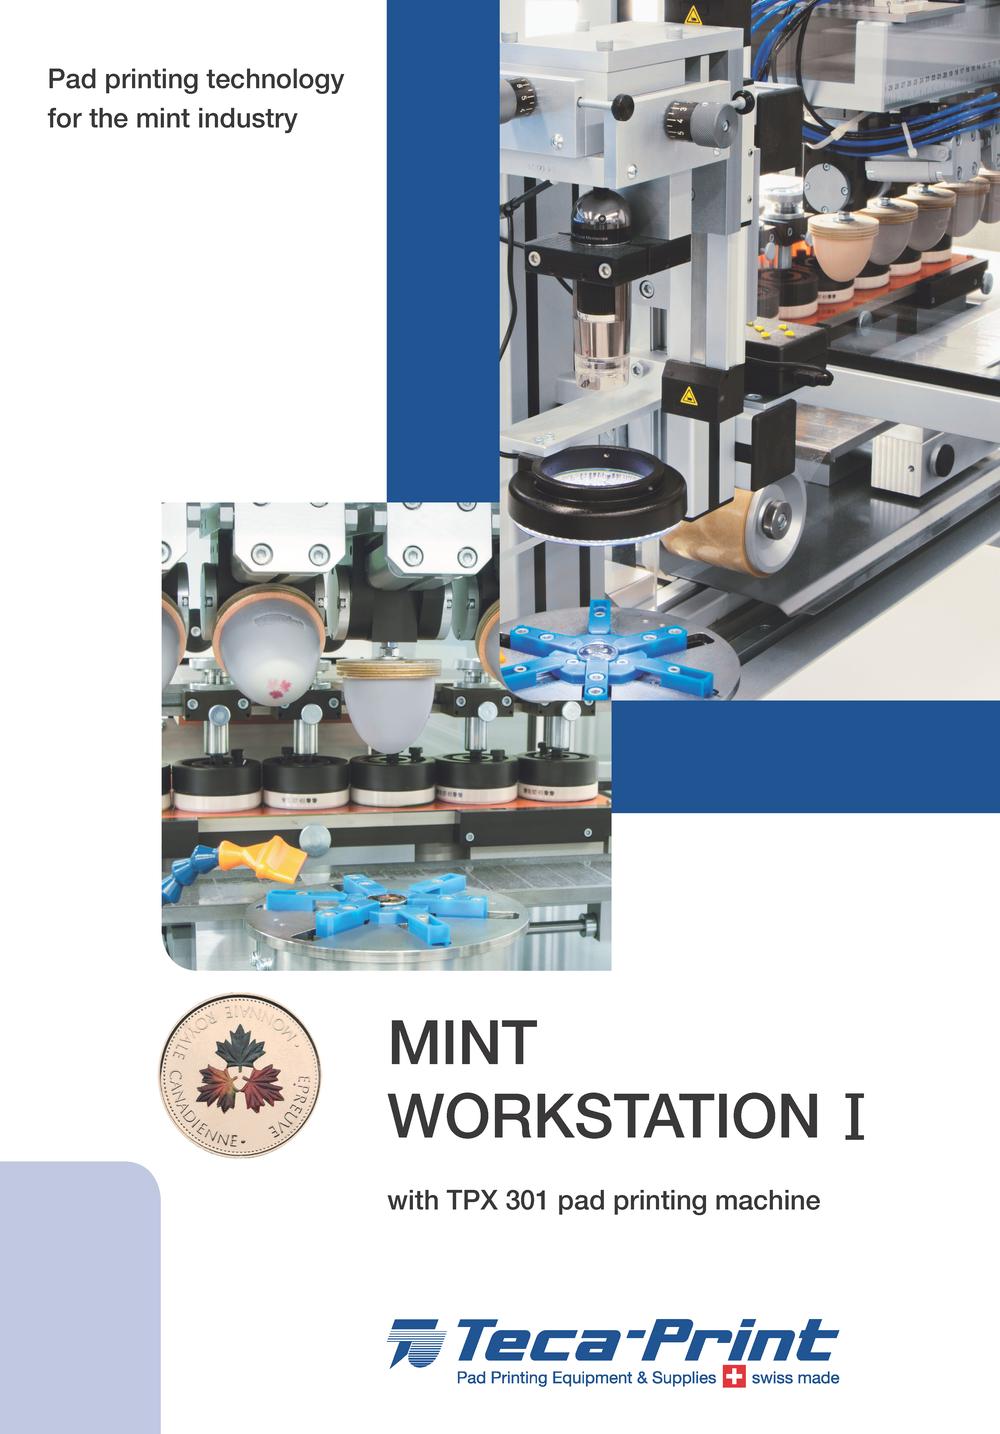 TPX 301_Mint Workstation_EN_Page_1.png